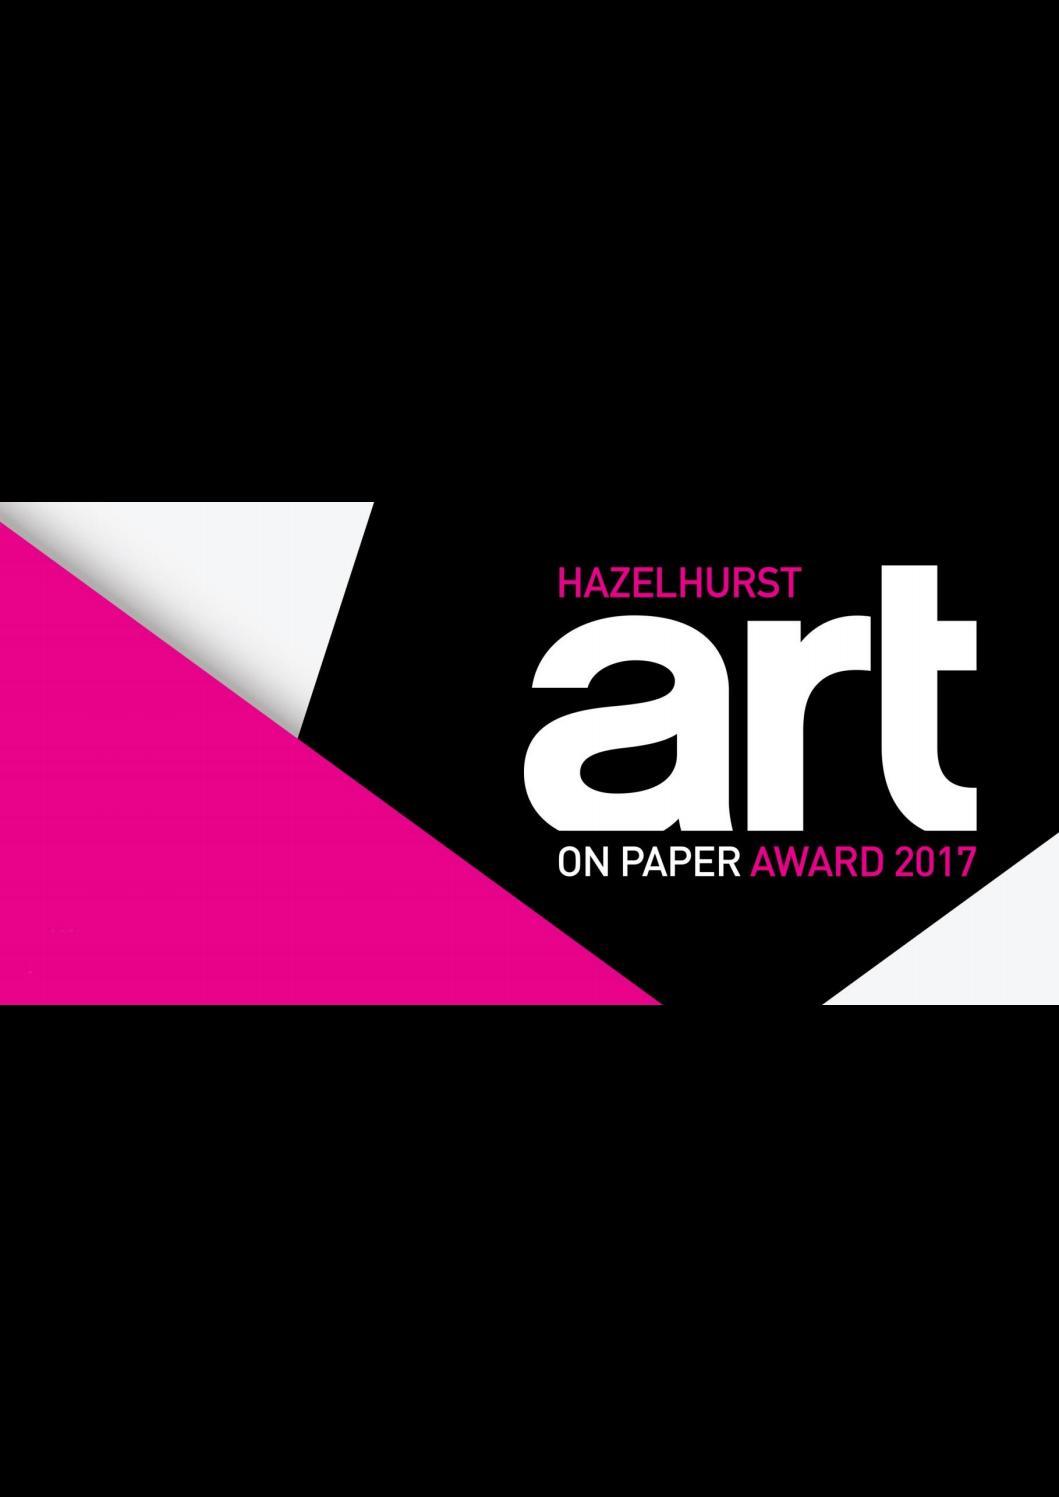 Hazelhurst Art On Paper Award 2017 By Hazelhurst Arts Centre Issuu